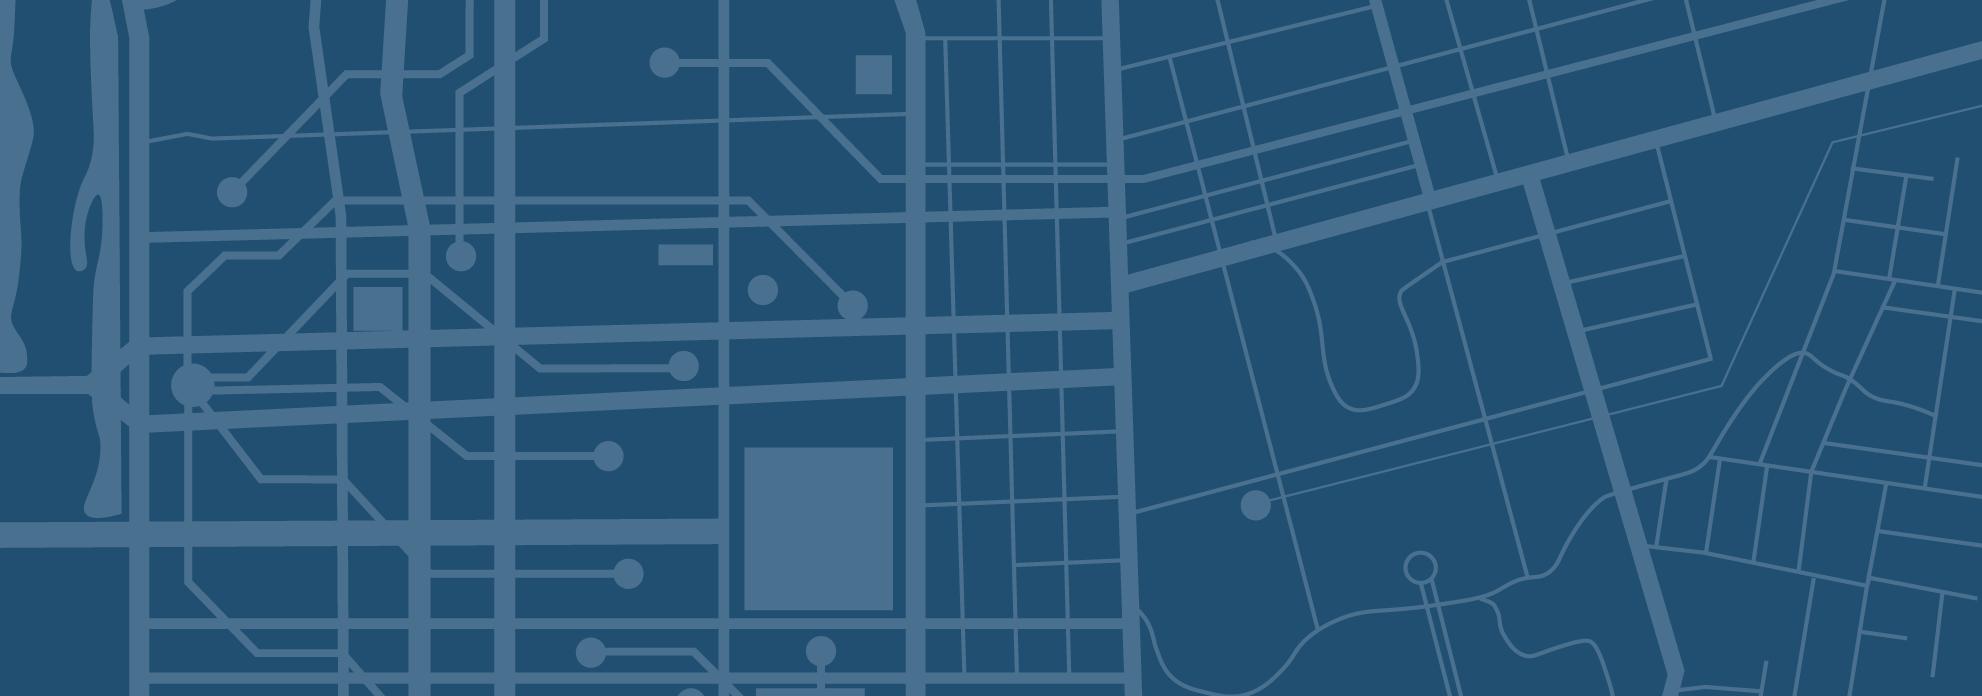 Austin Tech Alliance Promotional Material -